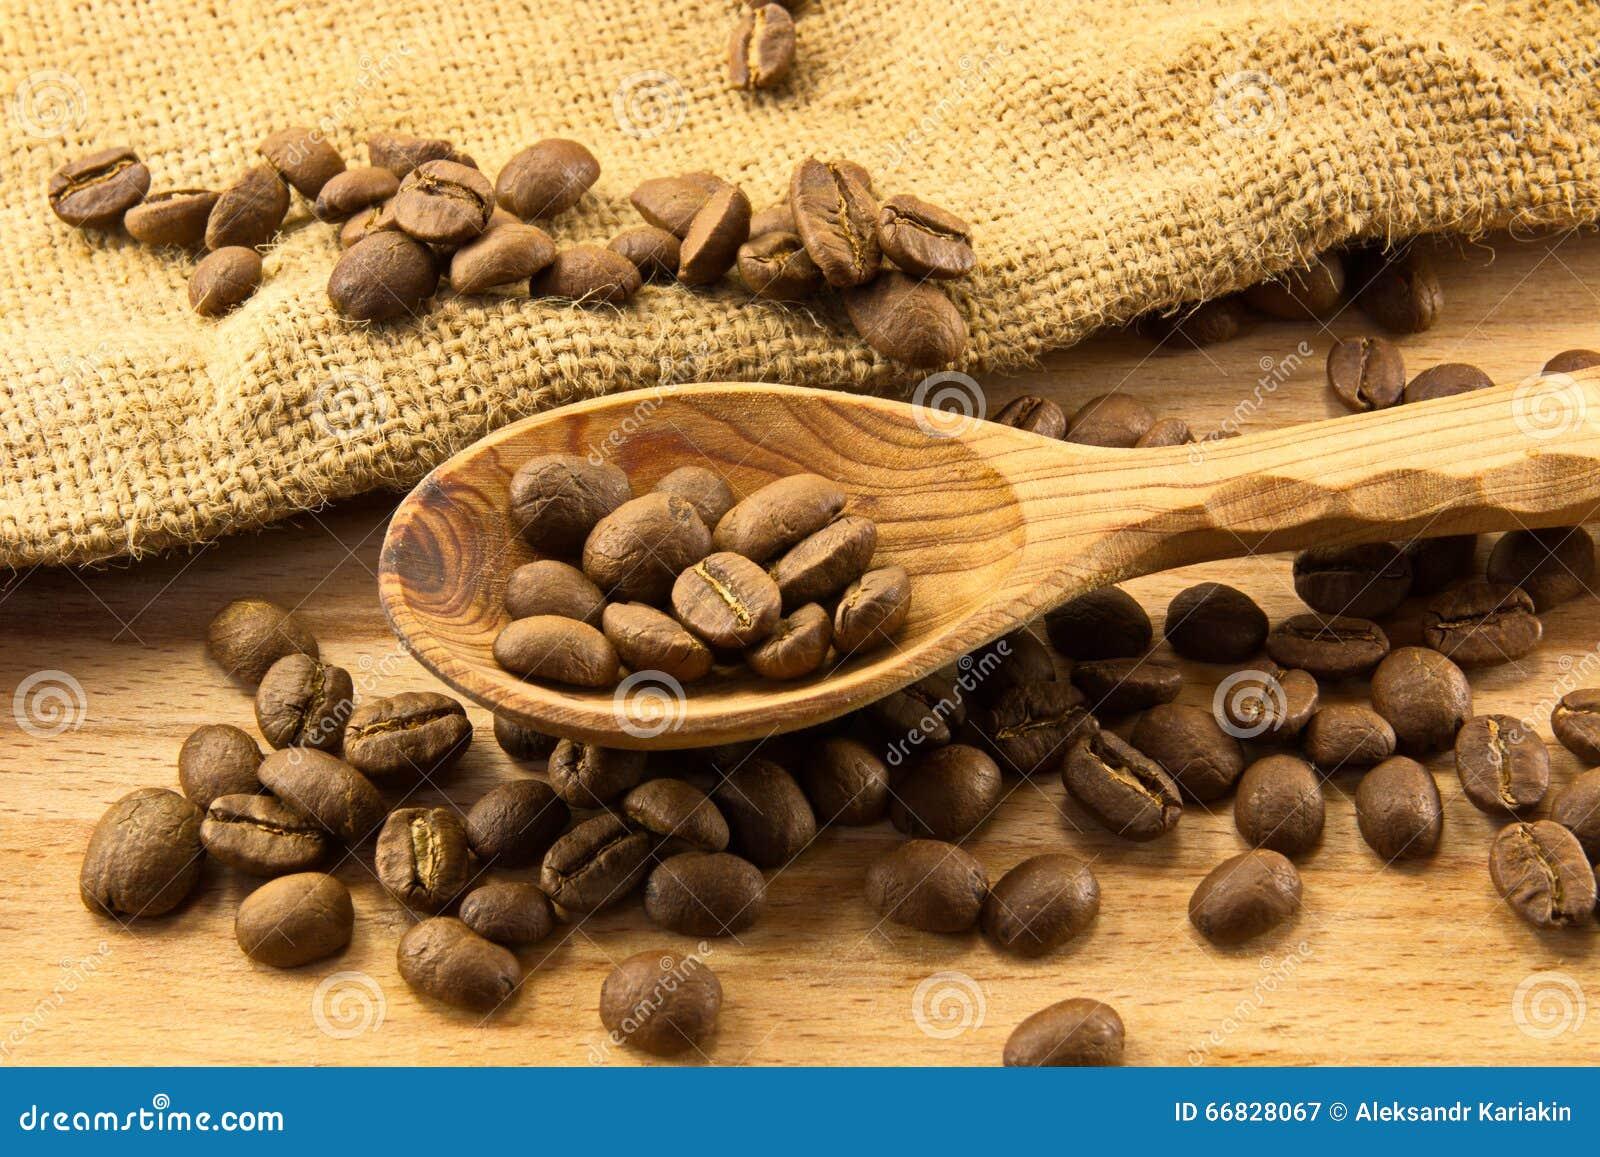 Houten lepel en koffie aan boord